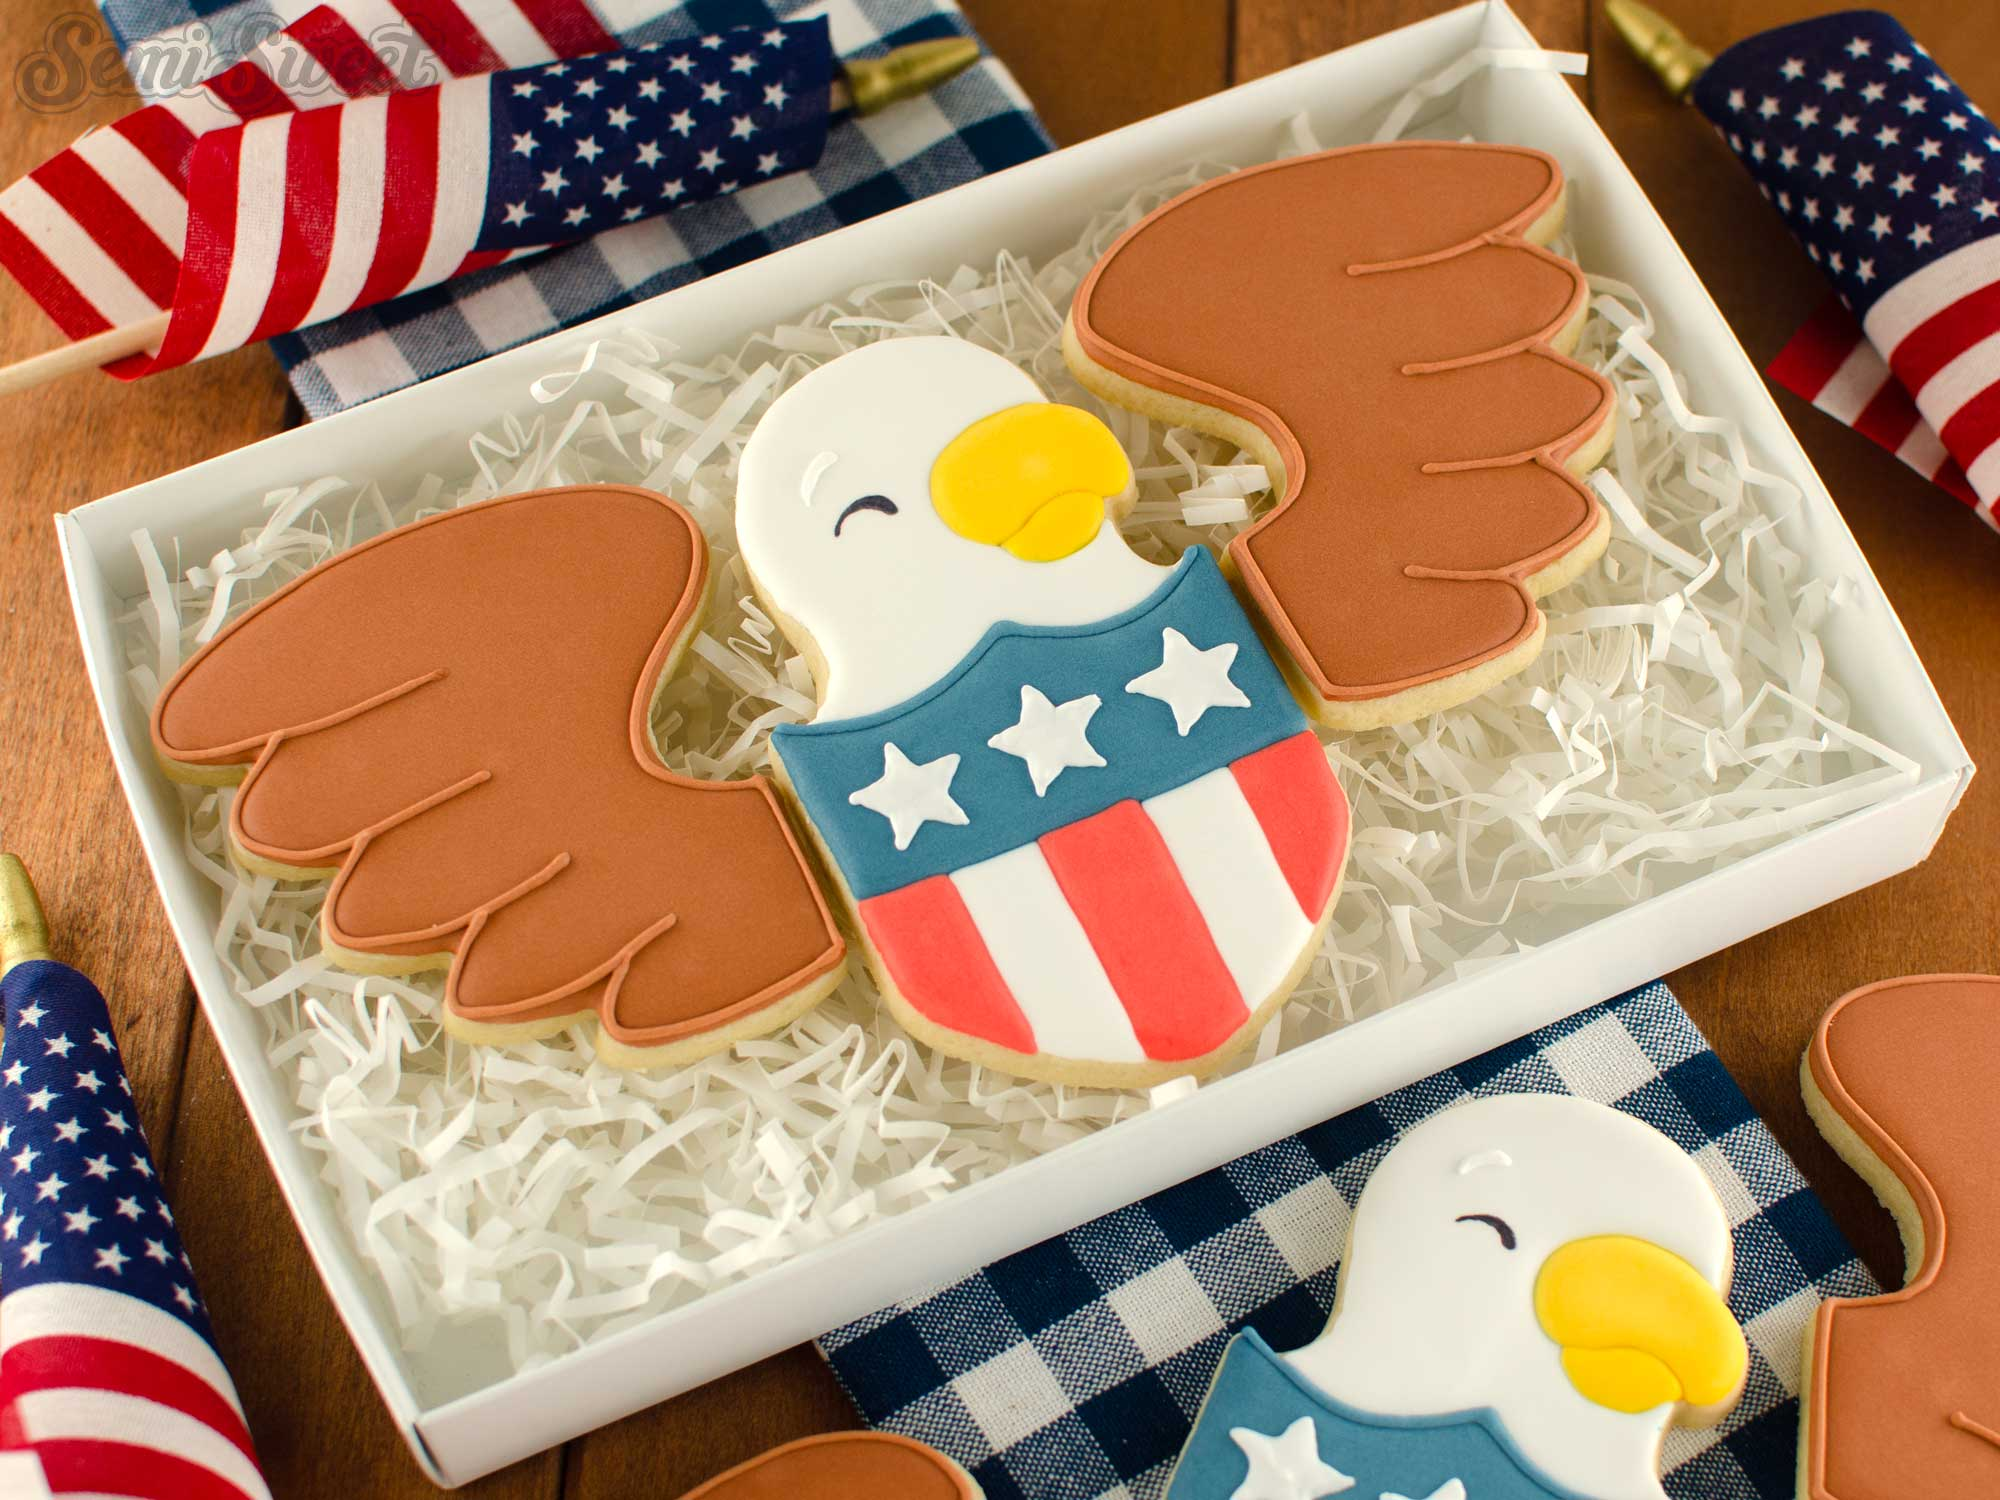 How to Make an Eagle Shield Cookie Set